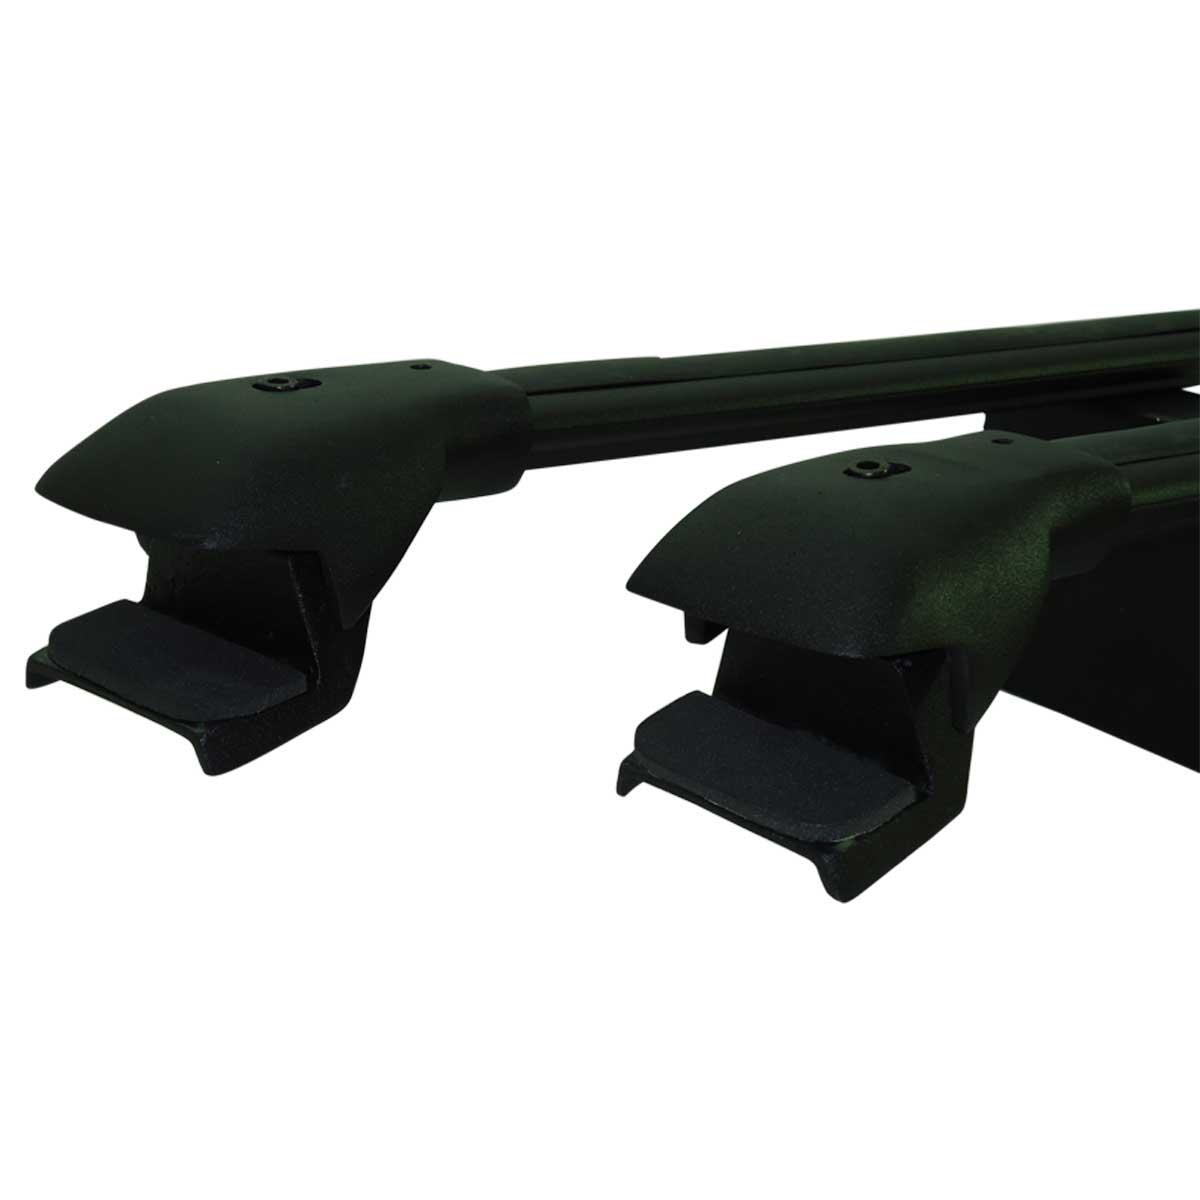 Travessa rack de teto larga preta alumínio Idea Adventure 2007 a 2016